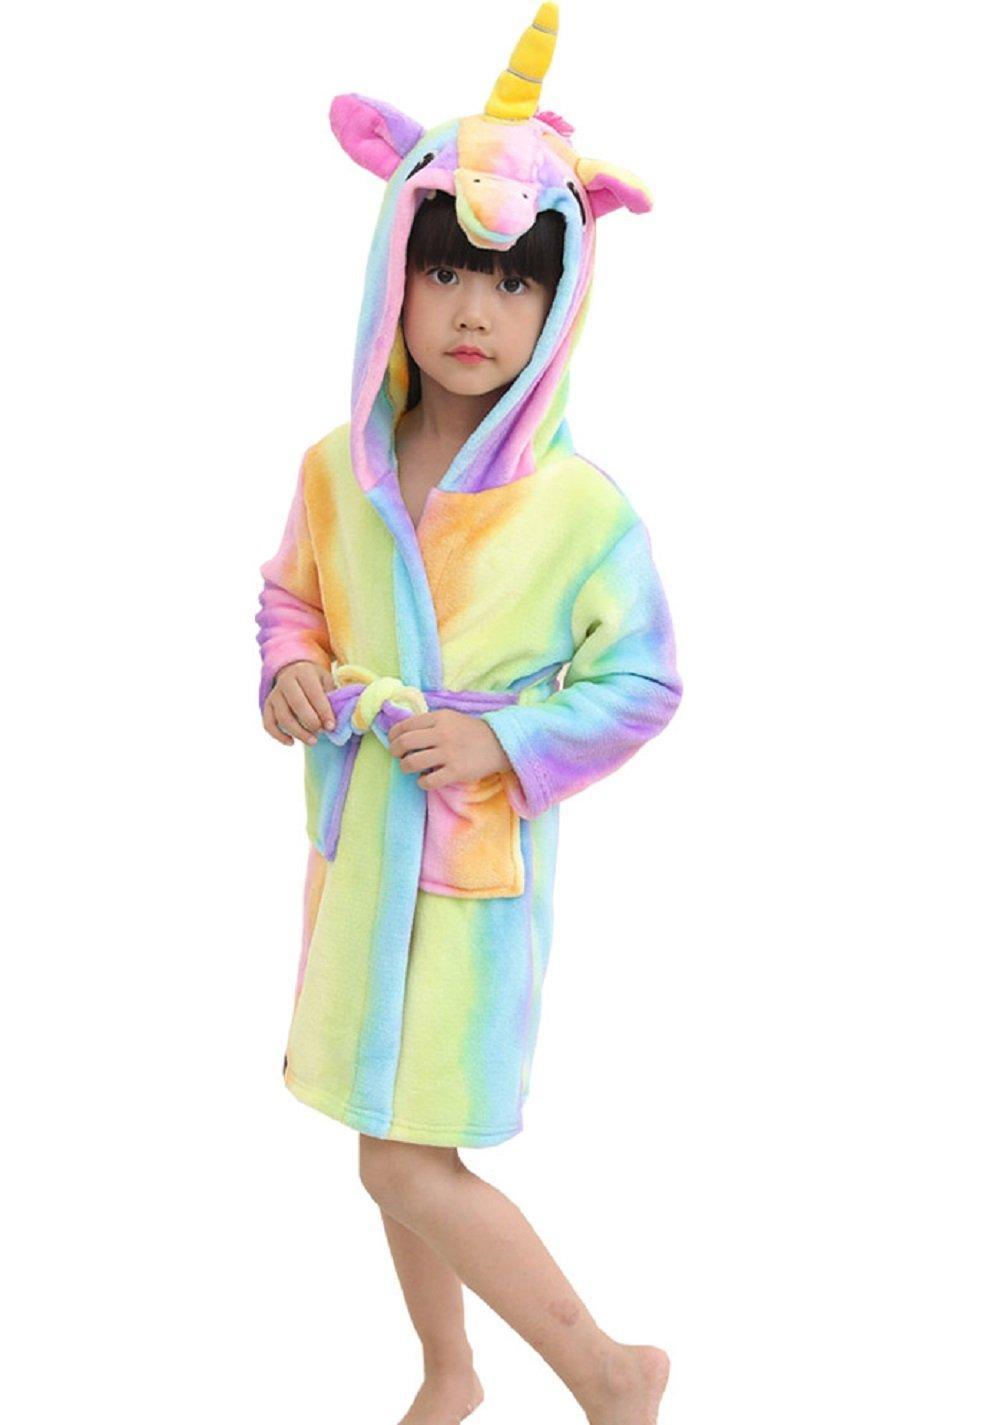 Hotmall Kids Unicorn Bathrobe Hooded Animal Flannel Sleepwear Dressing Gown  Children Unisex Star Rainbow Cosplay Costumes Pyjamas Soft Warm Nightgown  Robe 945b17739